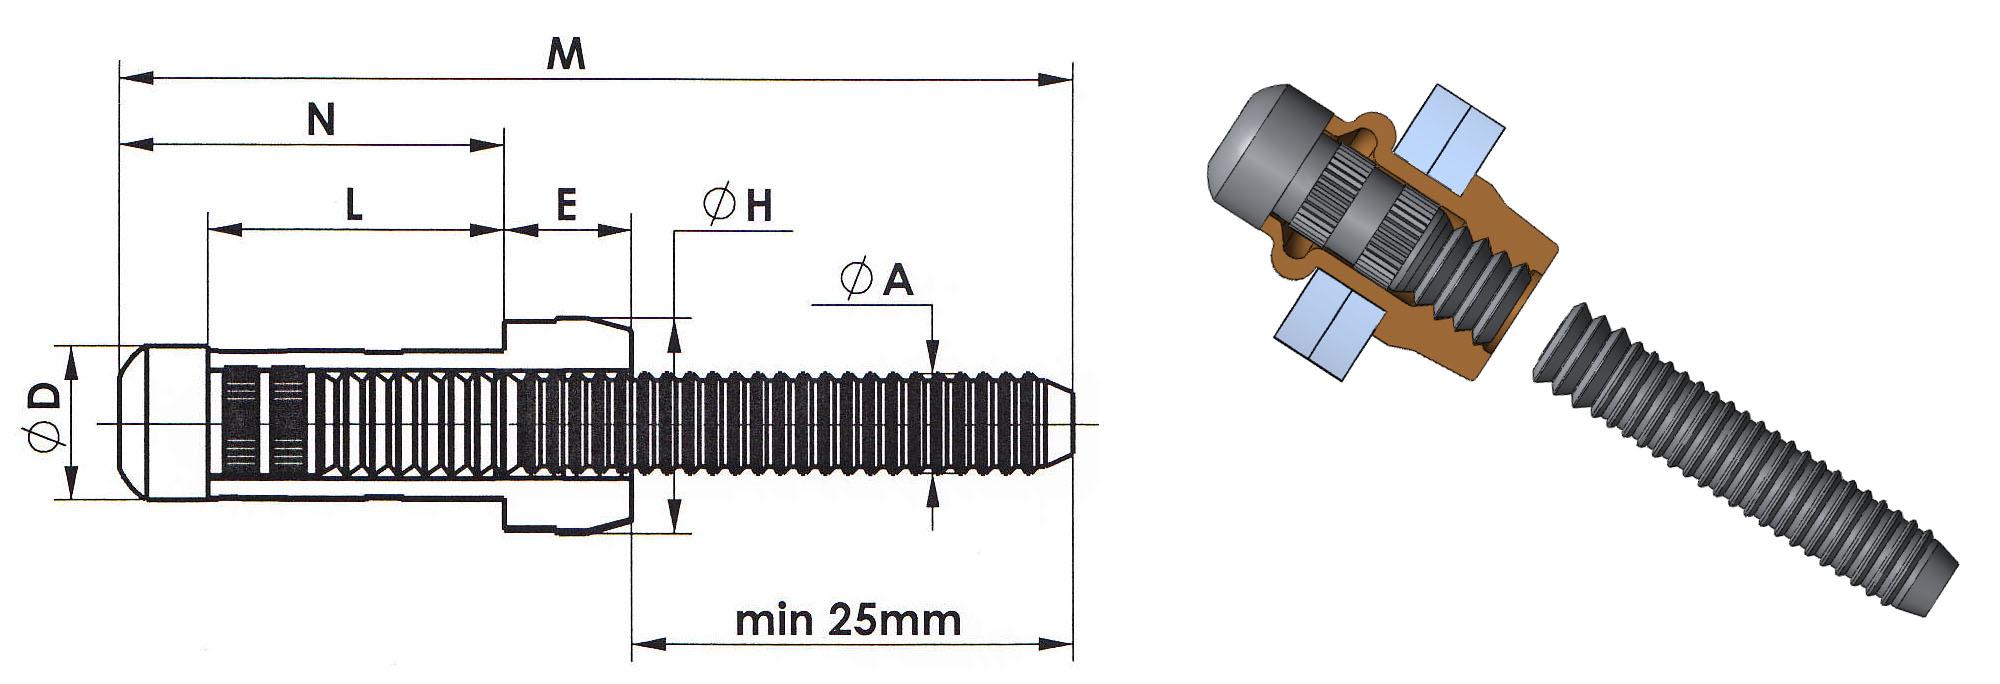 desenho técnico do rebite mega orlock